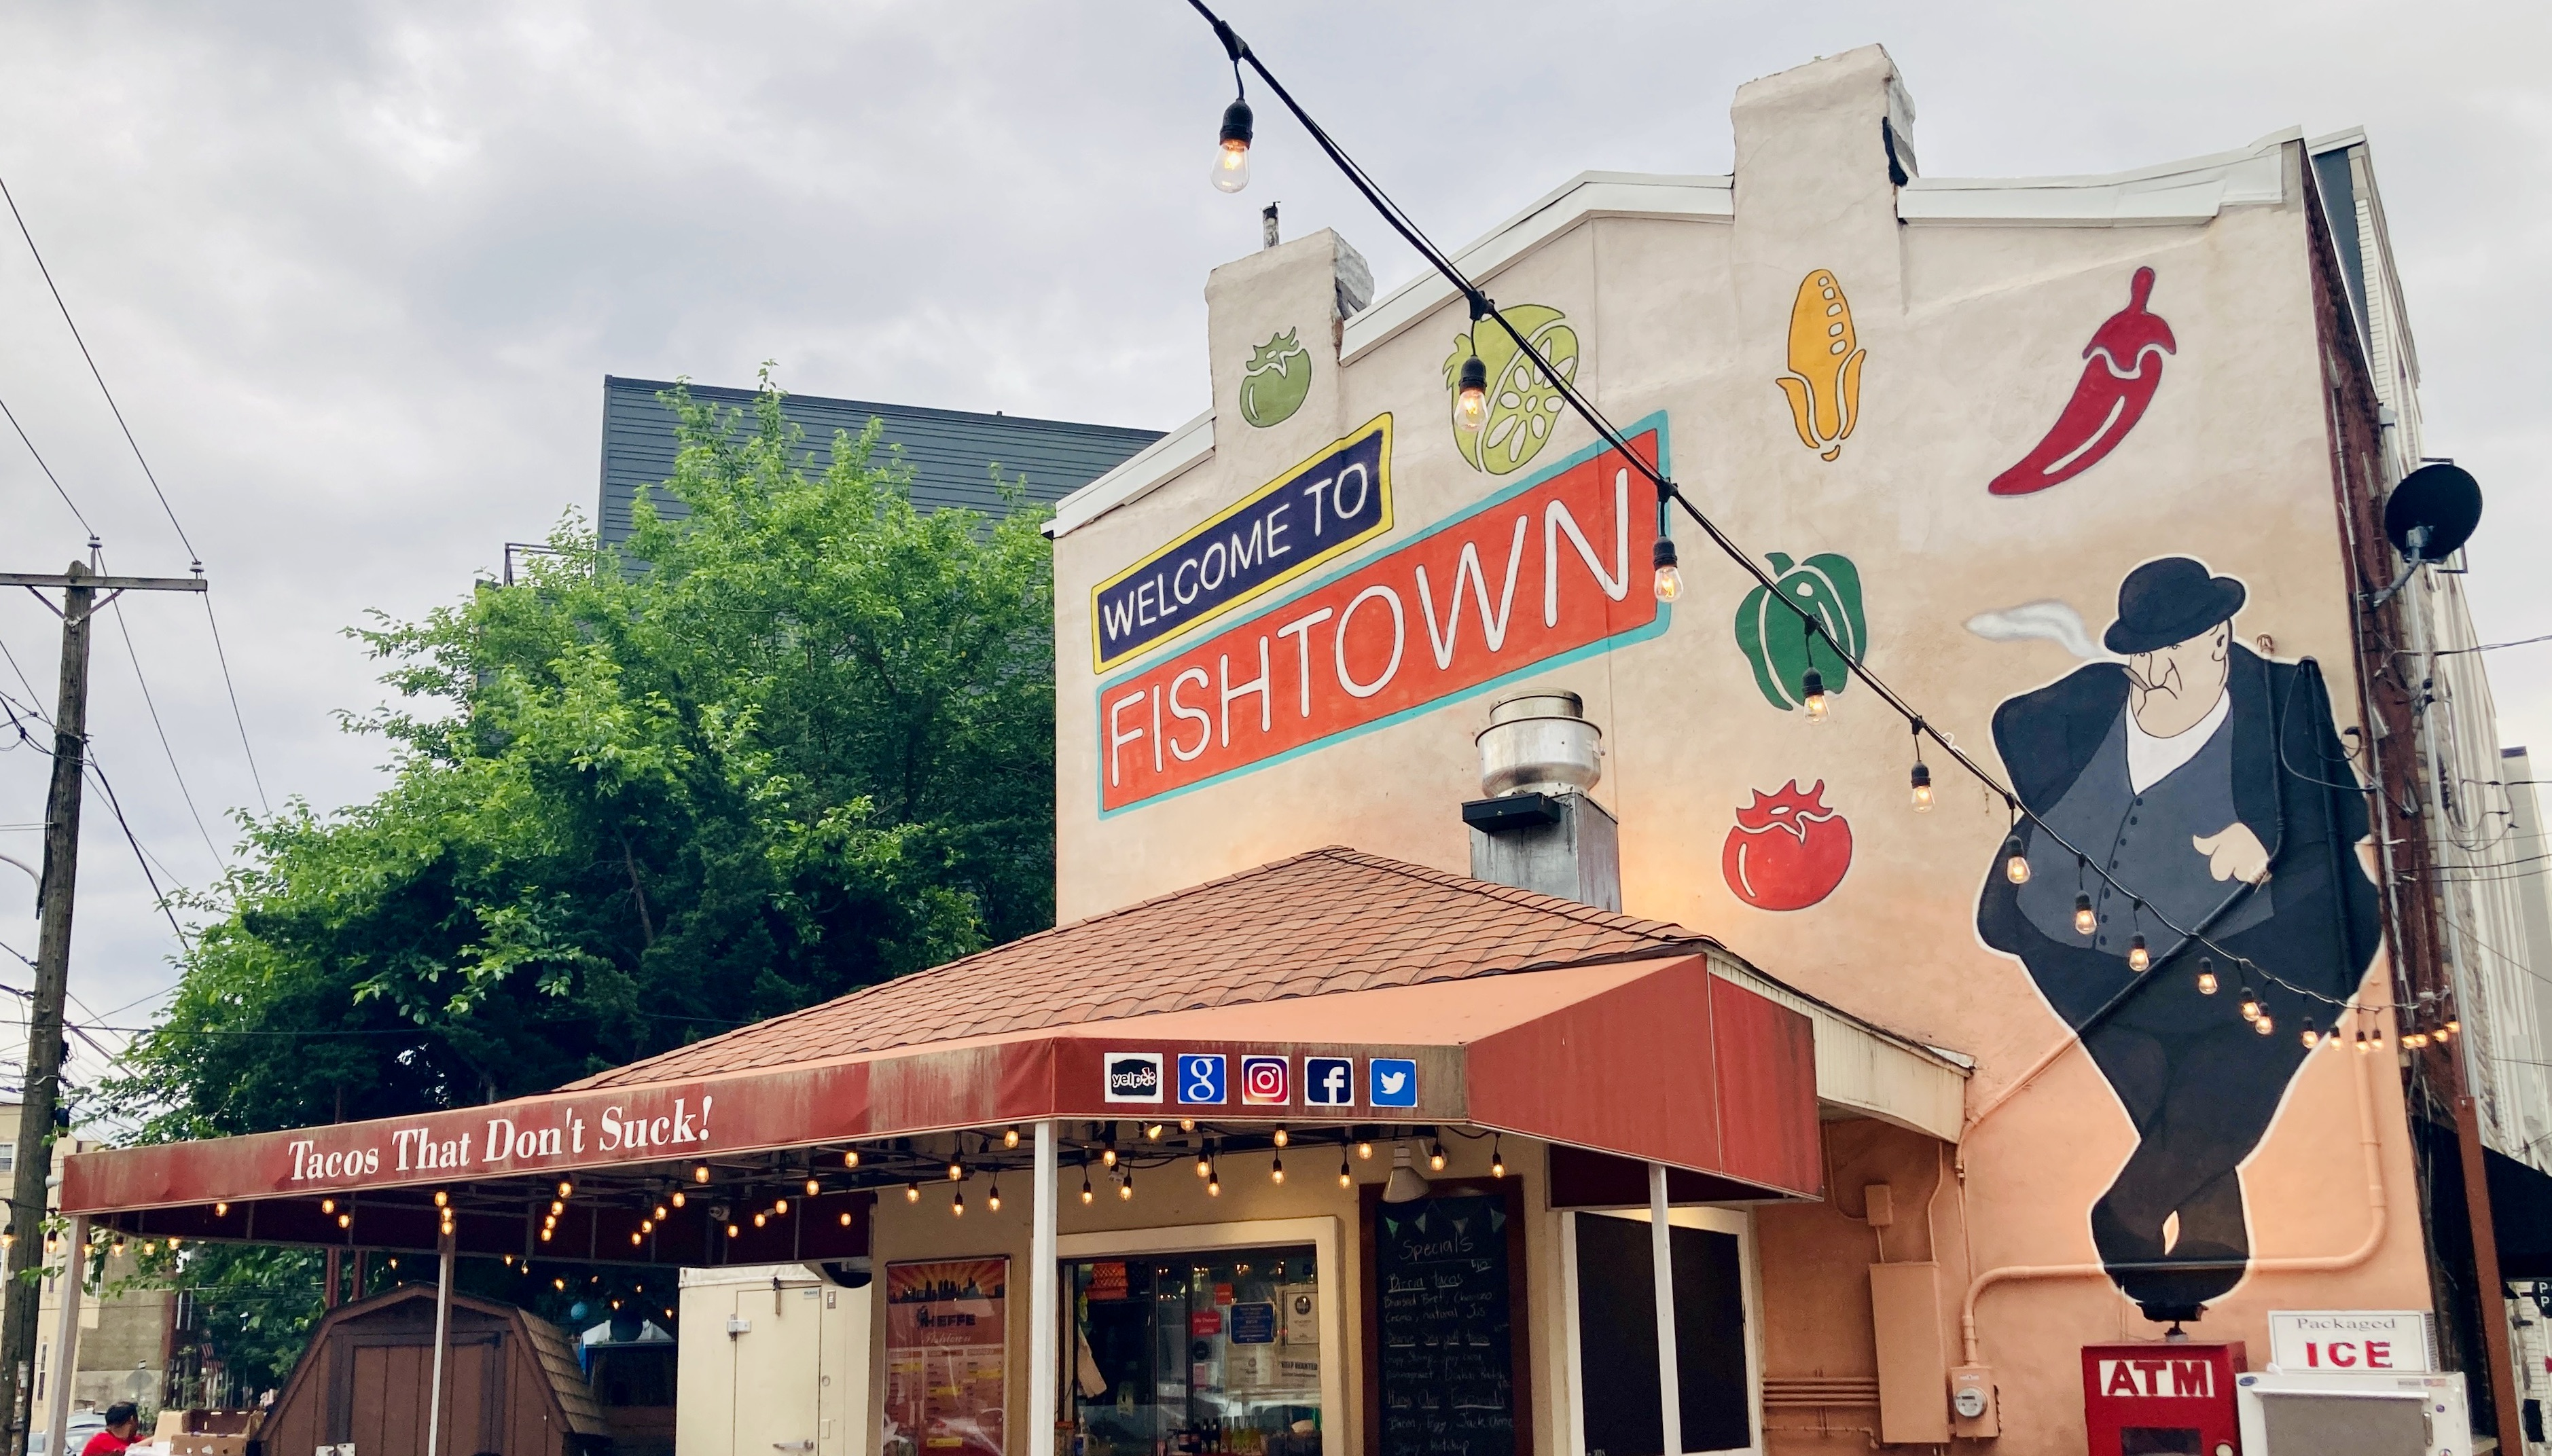 Heffe Tacos and Fishtown Mural